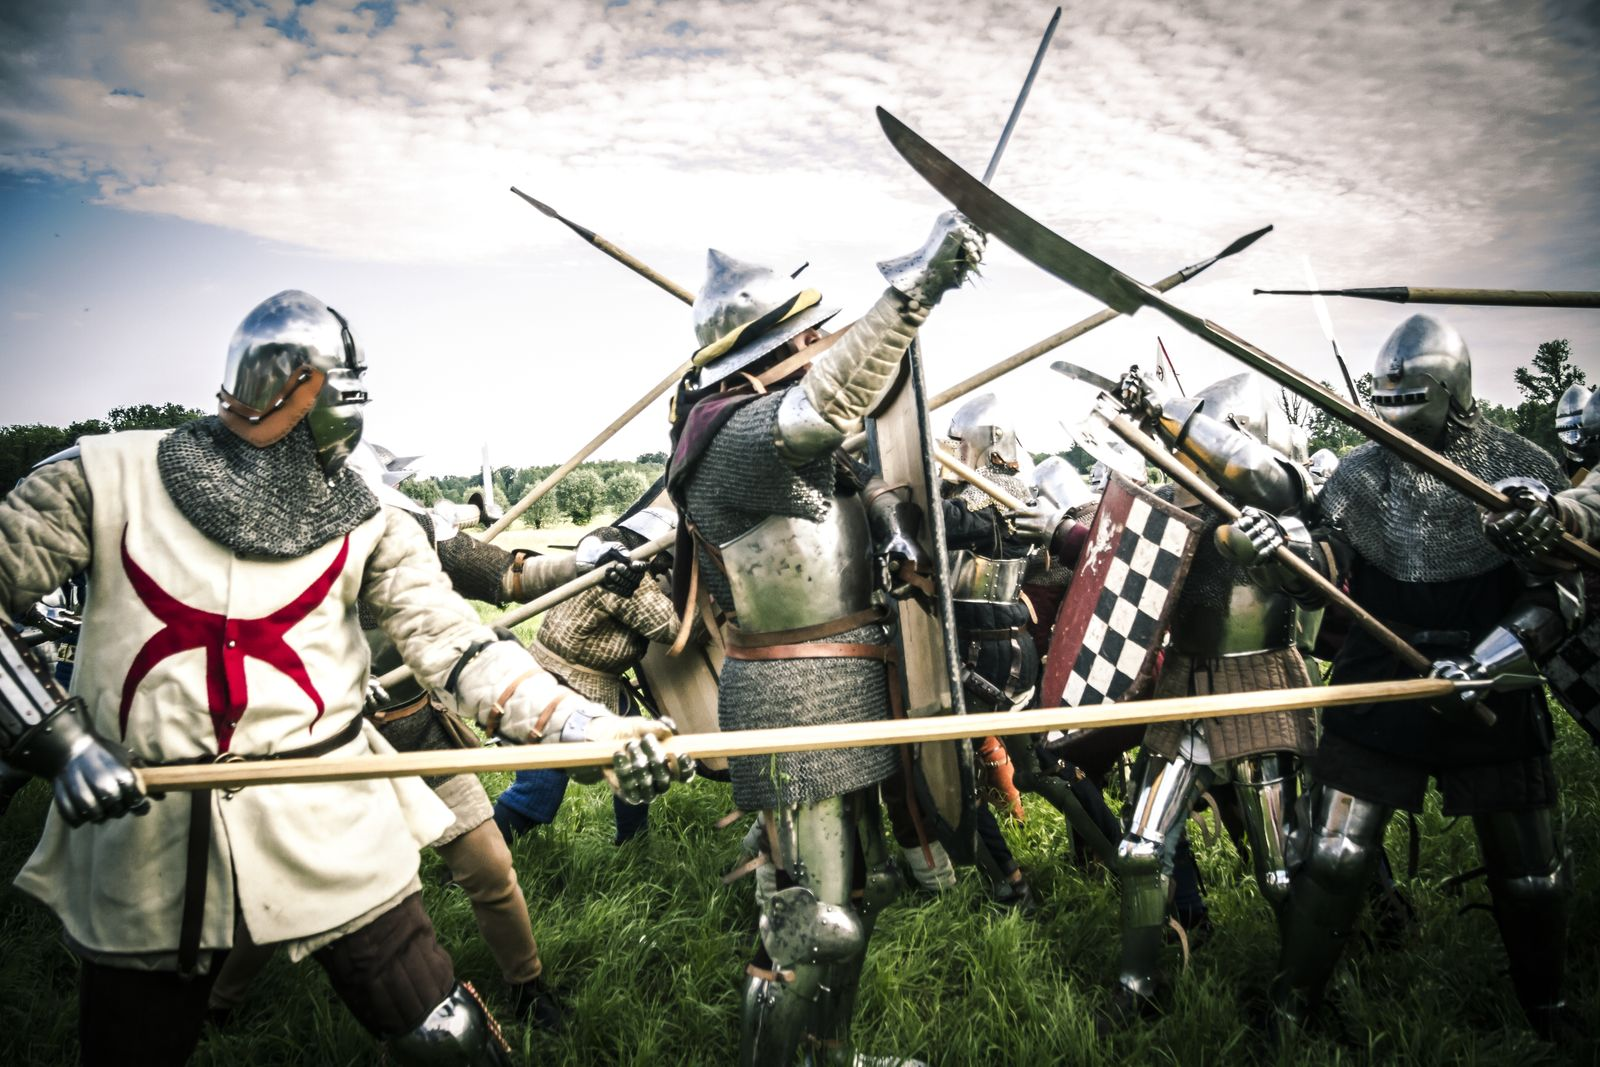 Mercenary soldiers, Historical reenactment